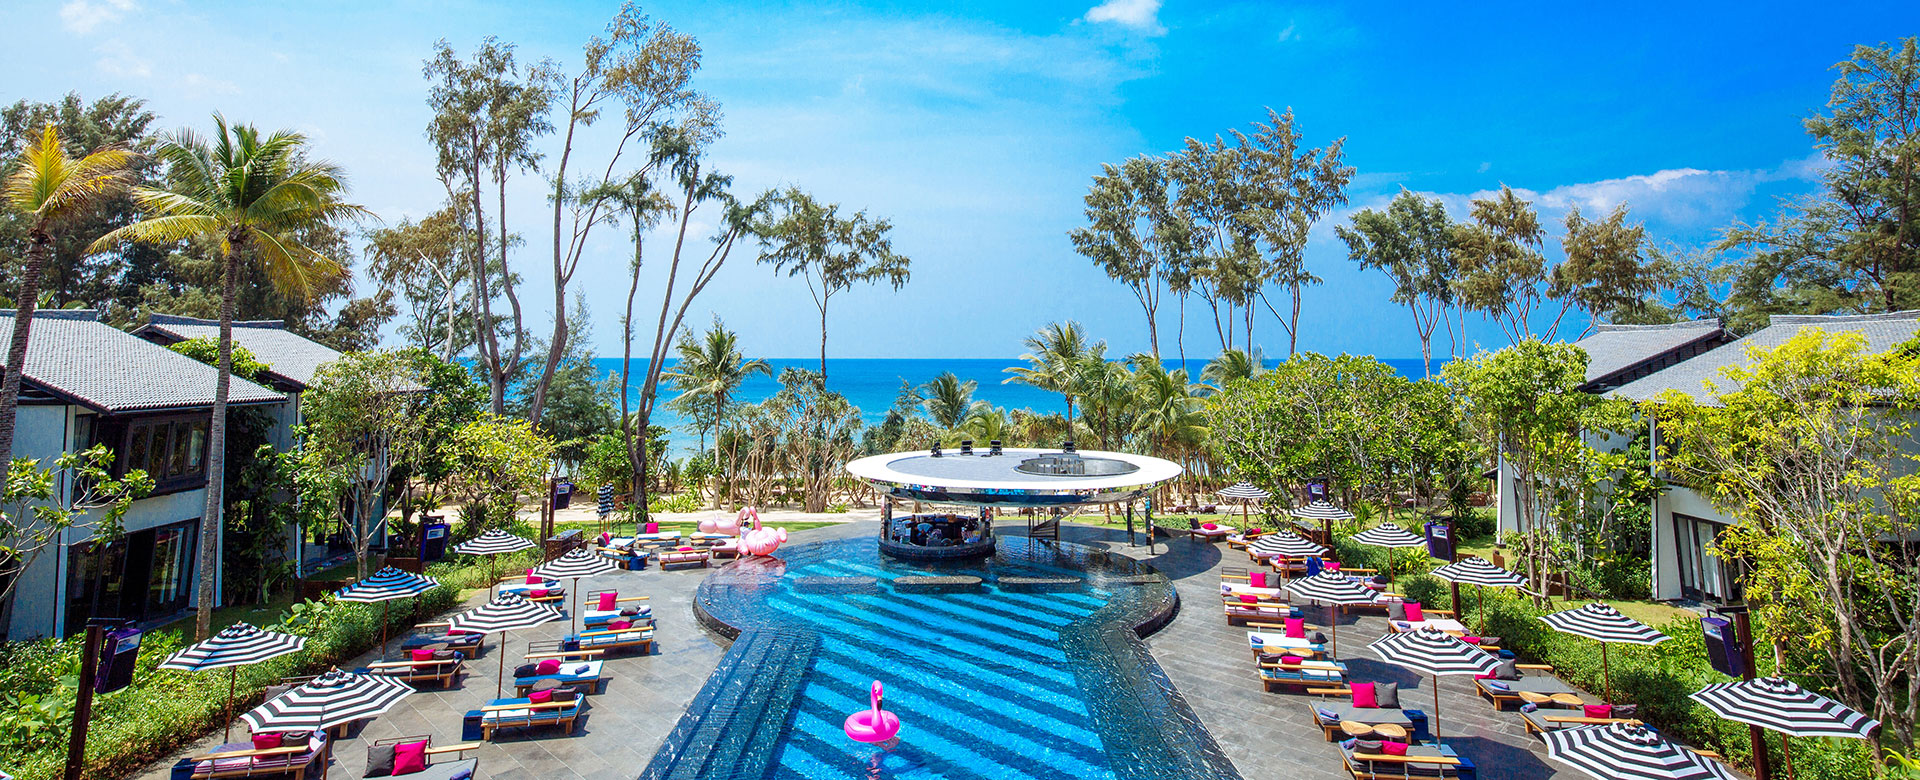 4-Facilities-Baba-Beach-Club-Luxury-Hotel-Phuket-by-Sri-Panwa